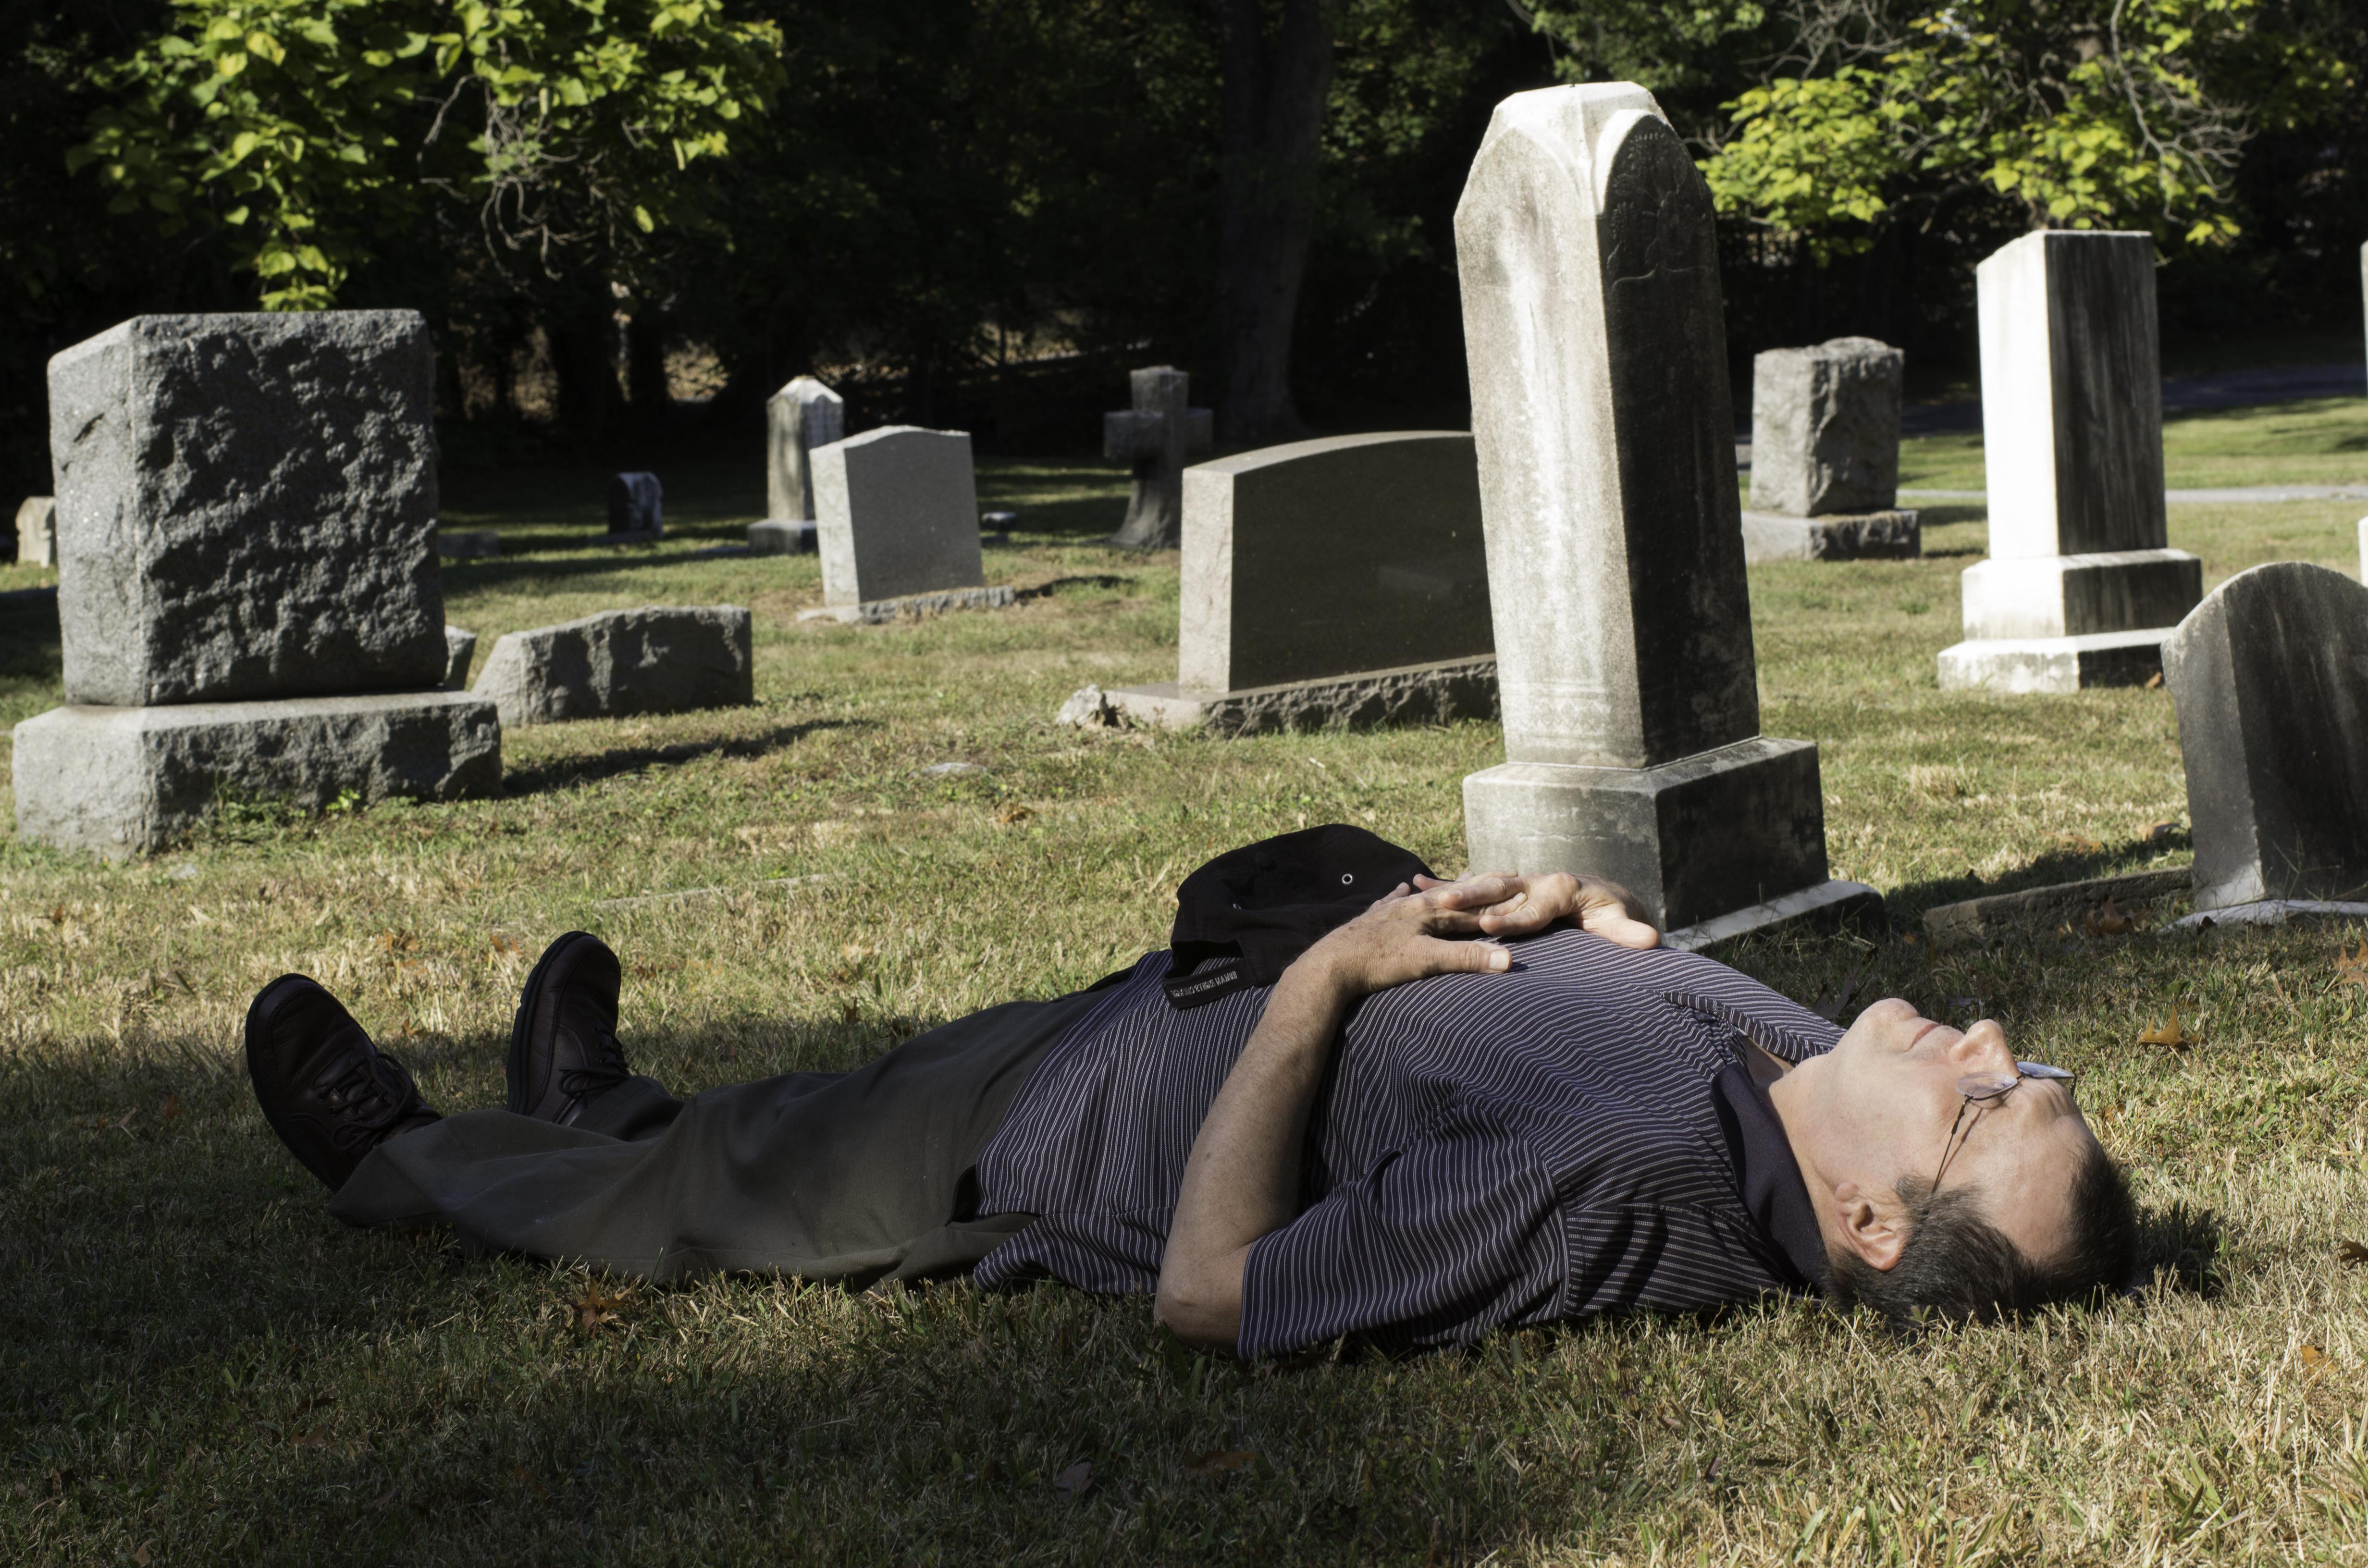 David is just sleeping photo by Gurganious-3109 Dave 2 copy 2